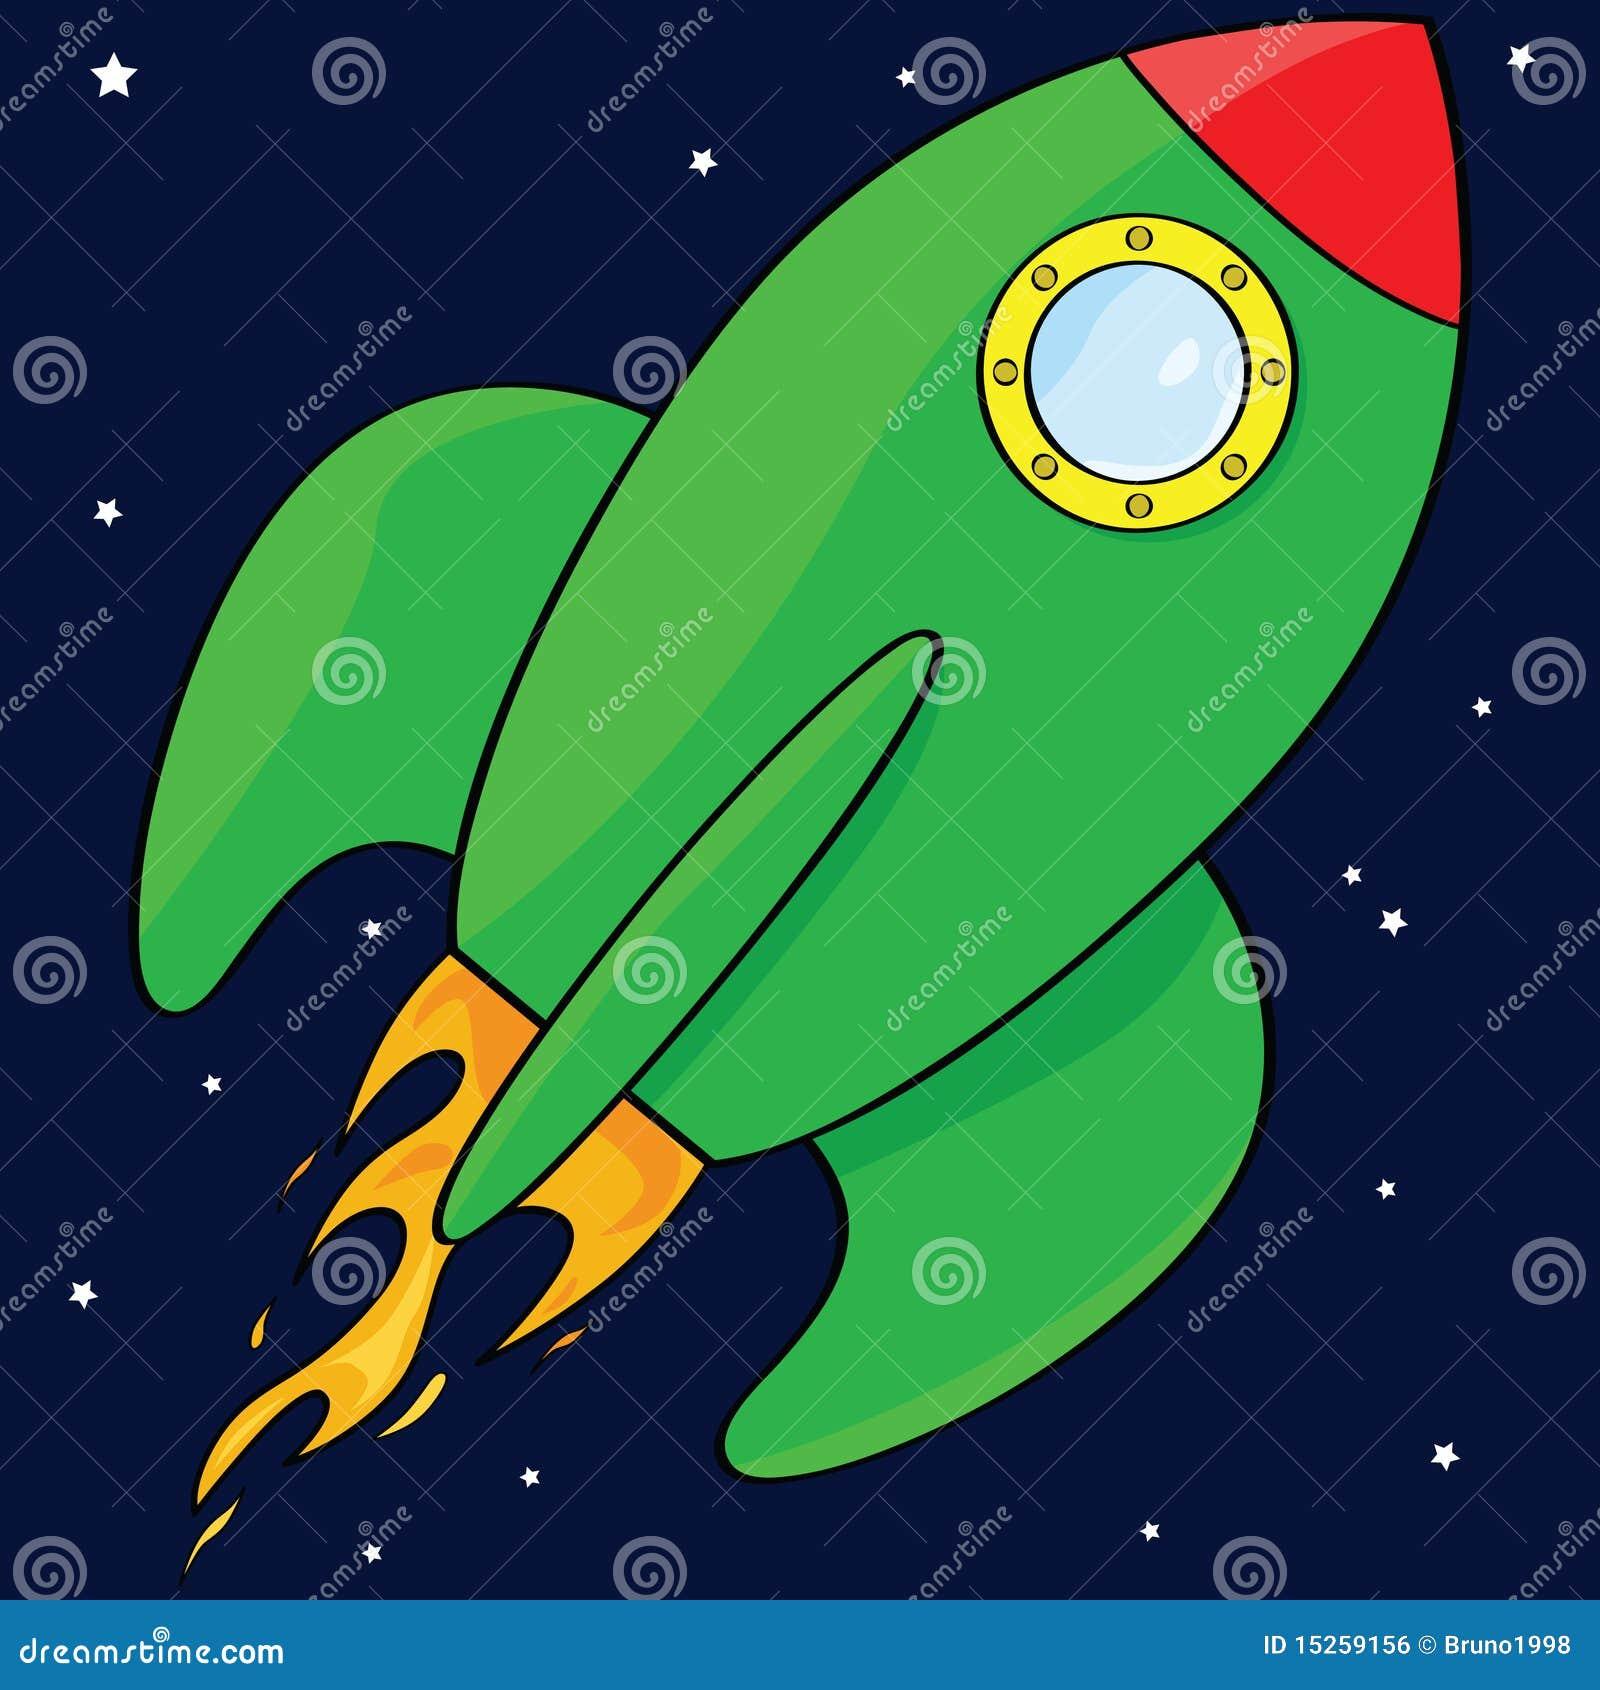 Cartoon Rocket Ship Royalty Free Stock Image - Image: 15259156